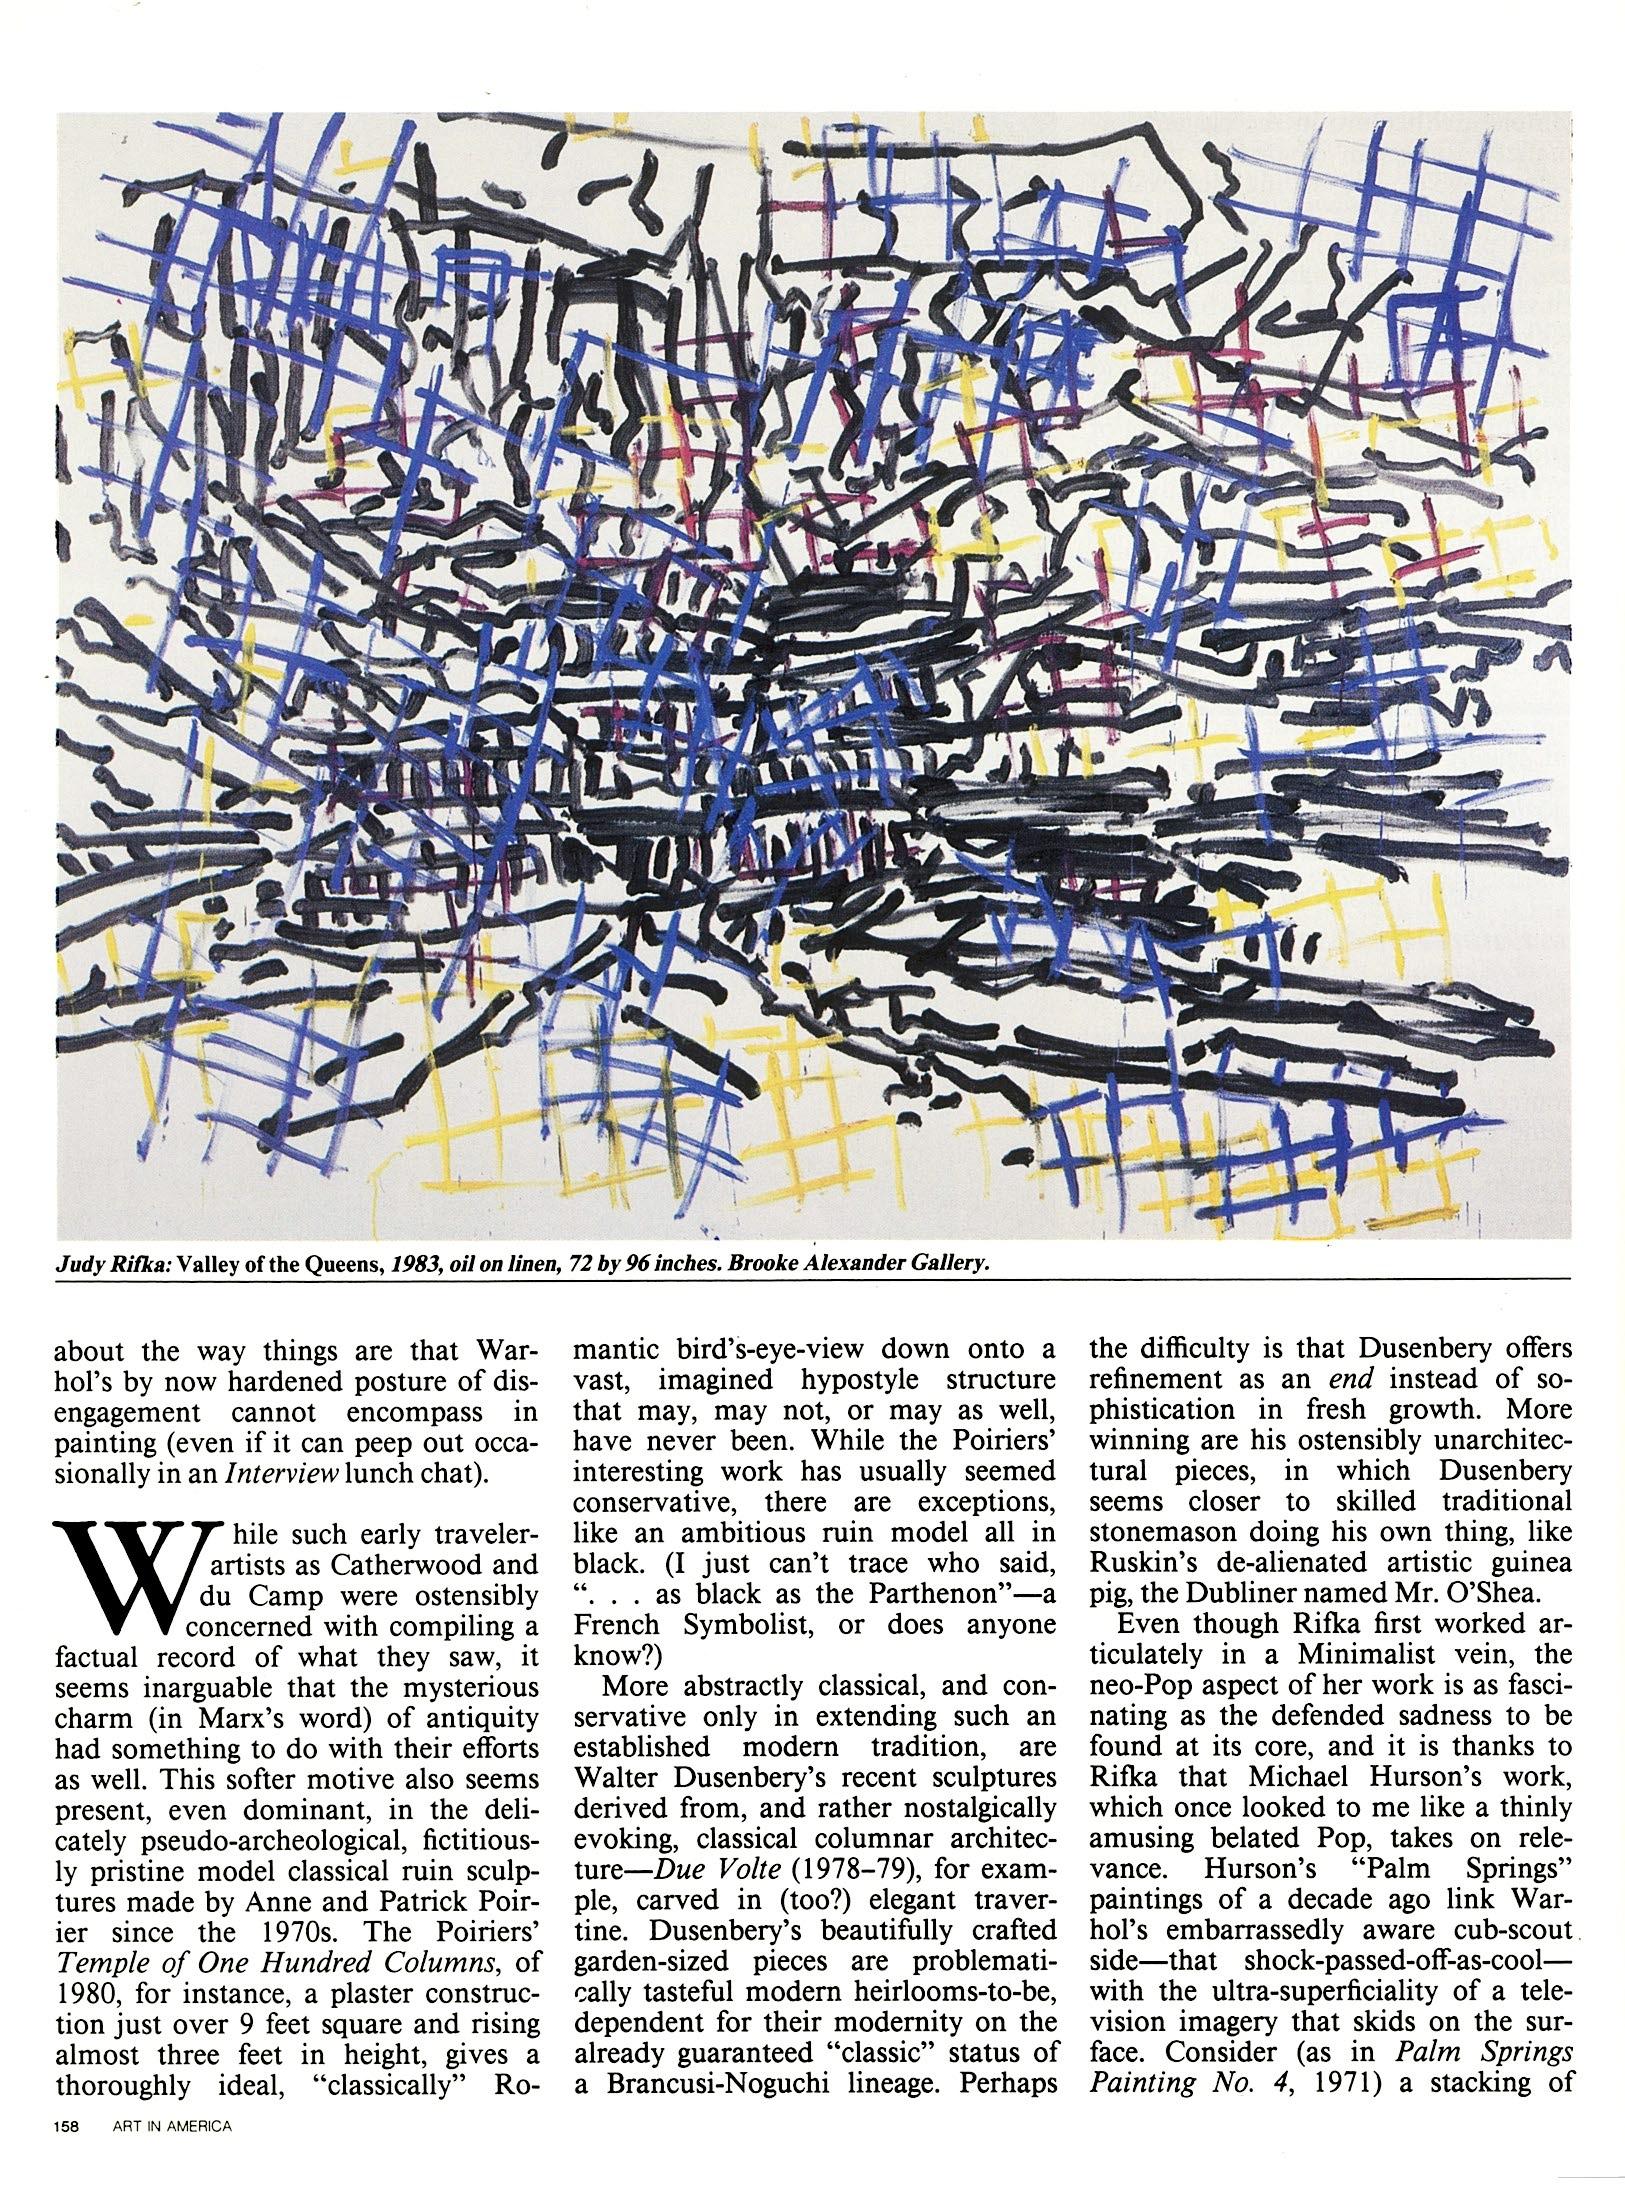 ART_IN_AMERICA_RIFKA_Page_12.jpg